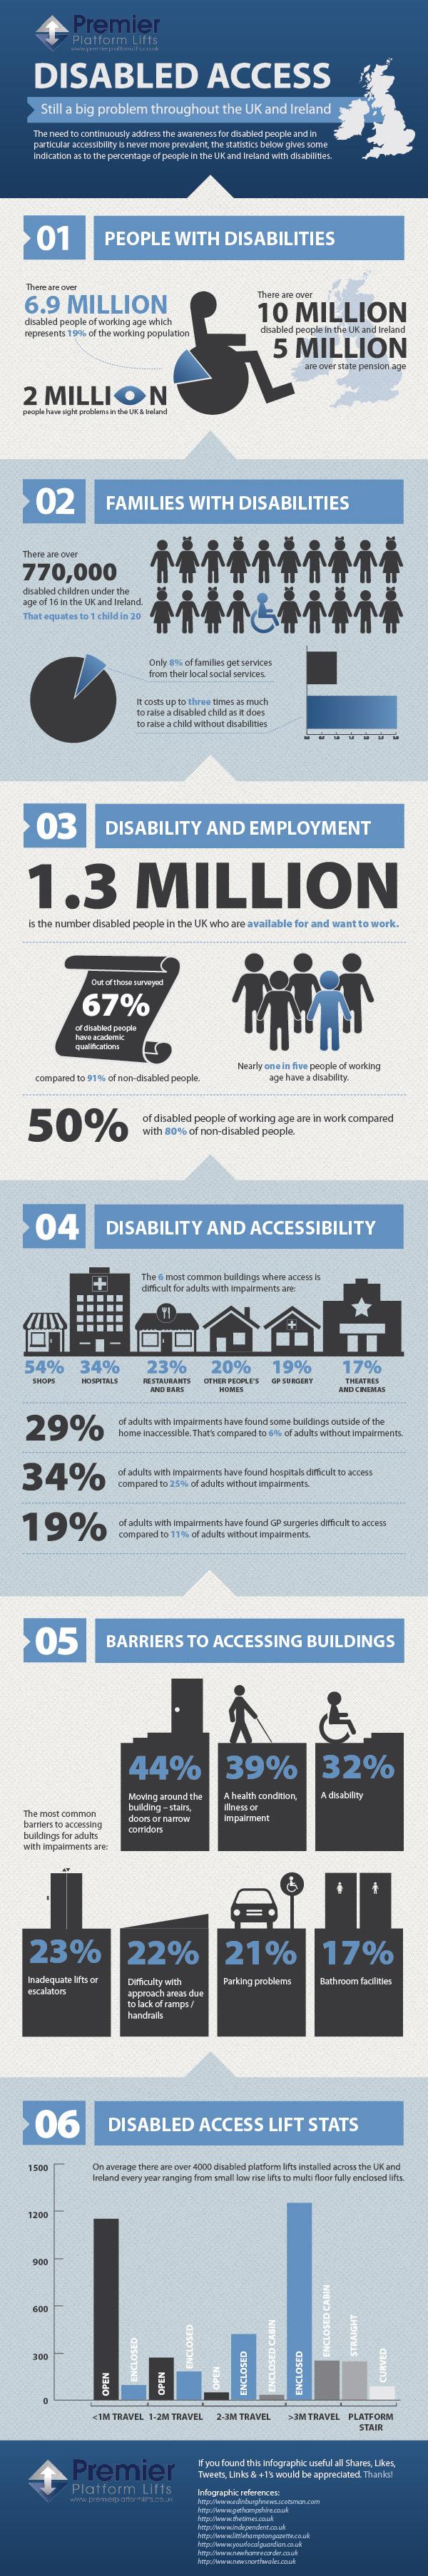 Disabled Access – Still A Major Problem